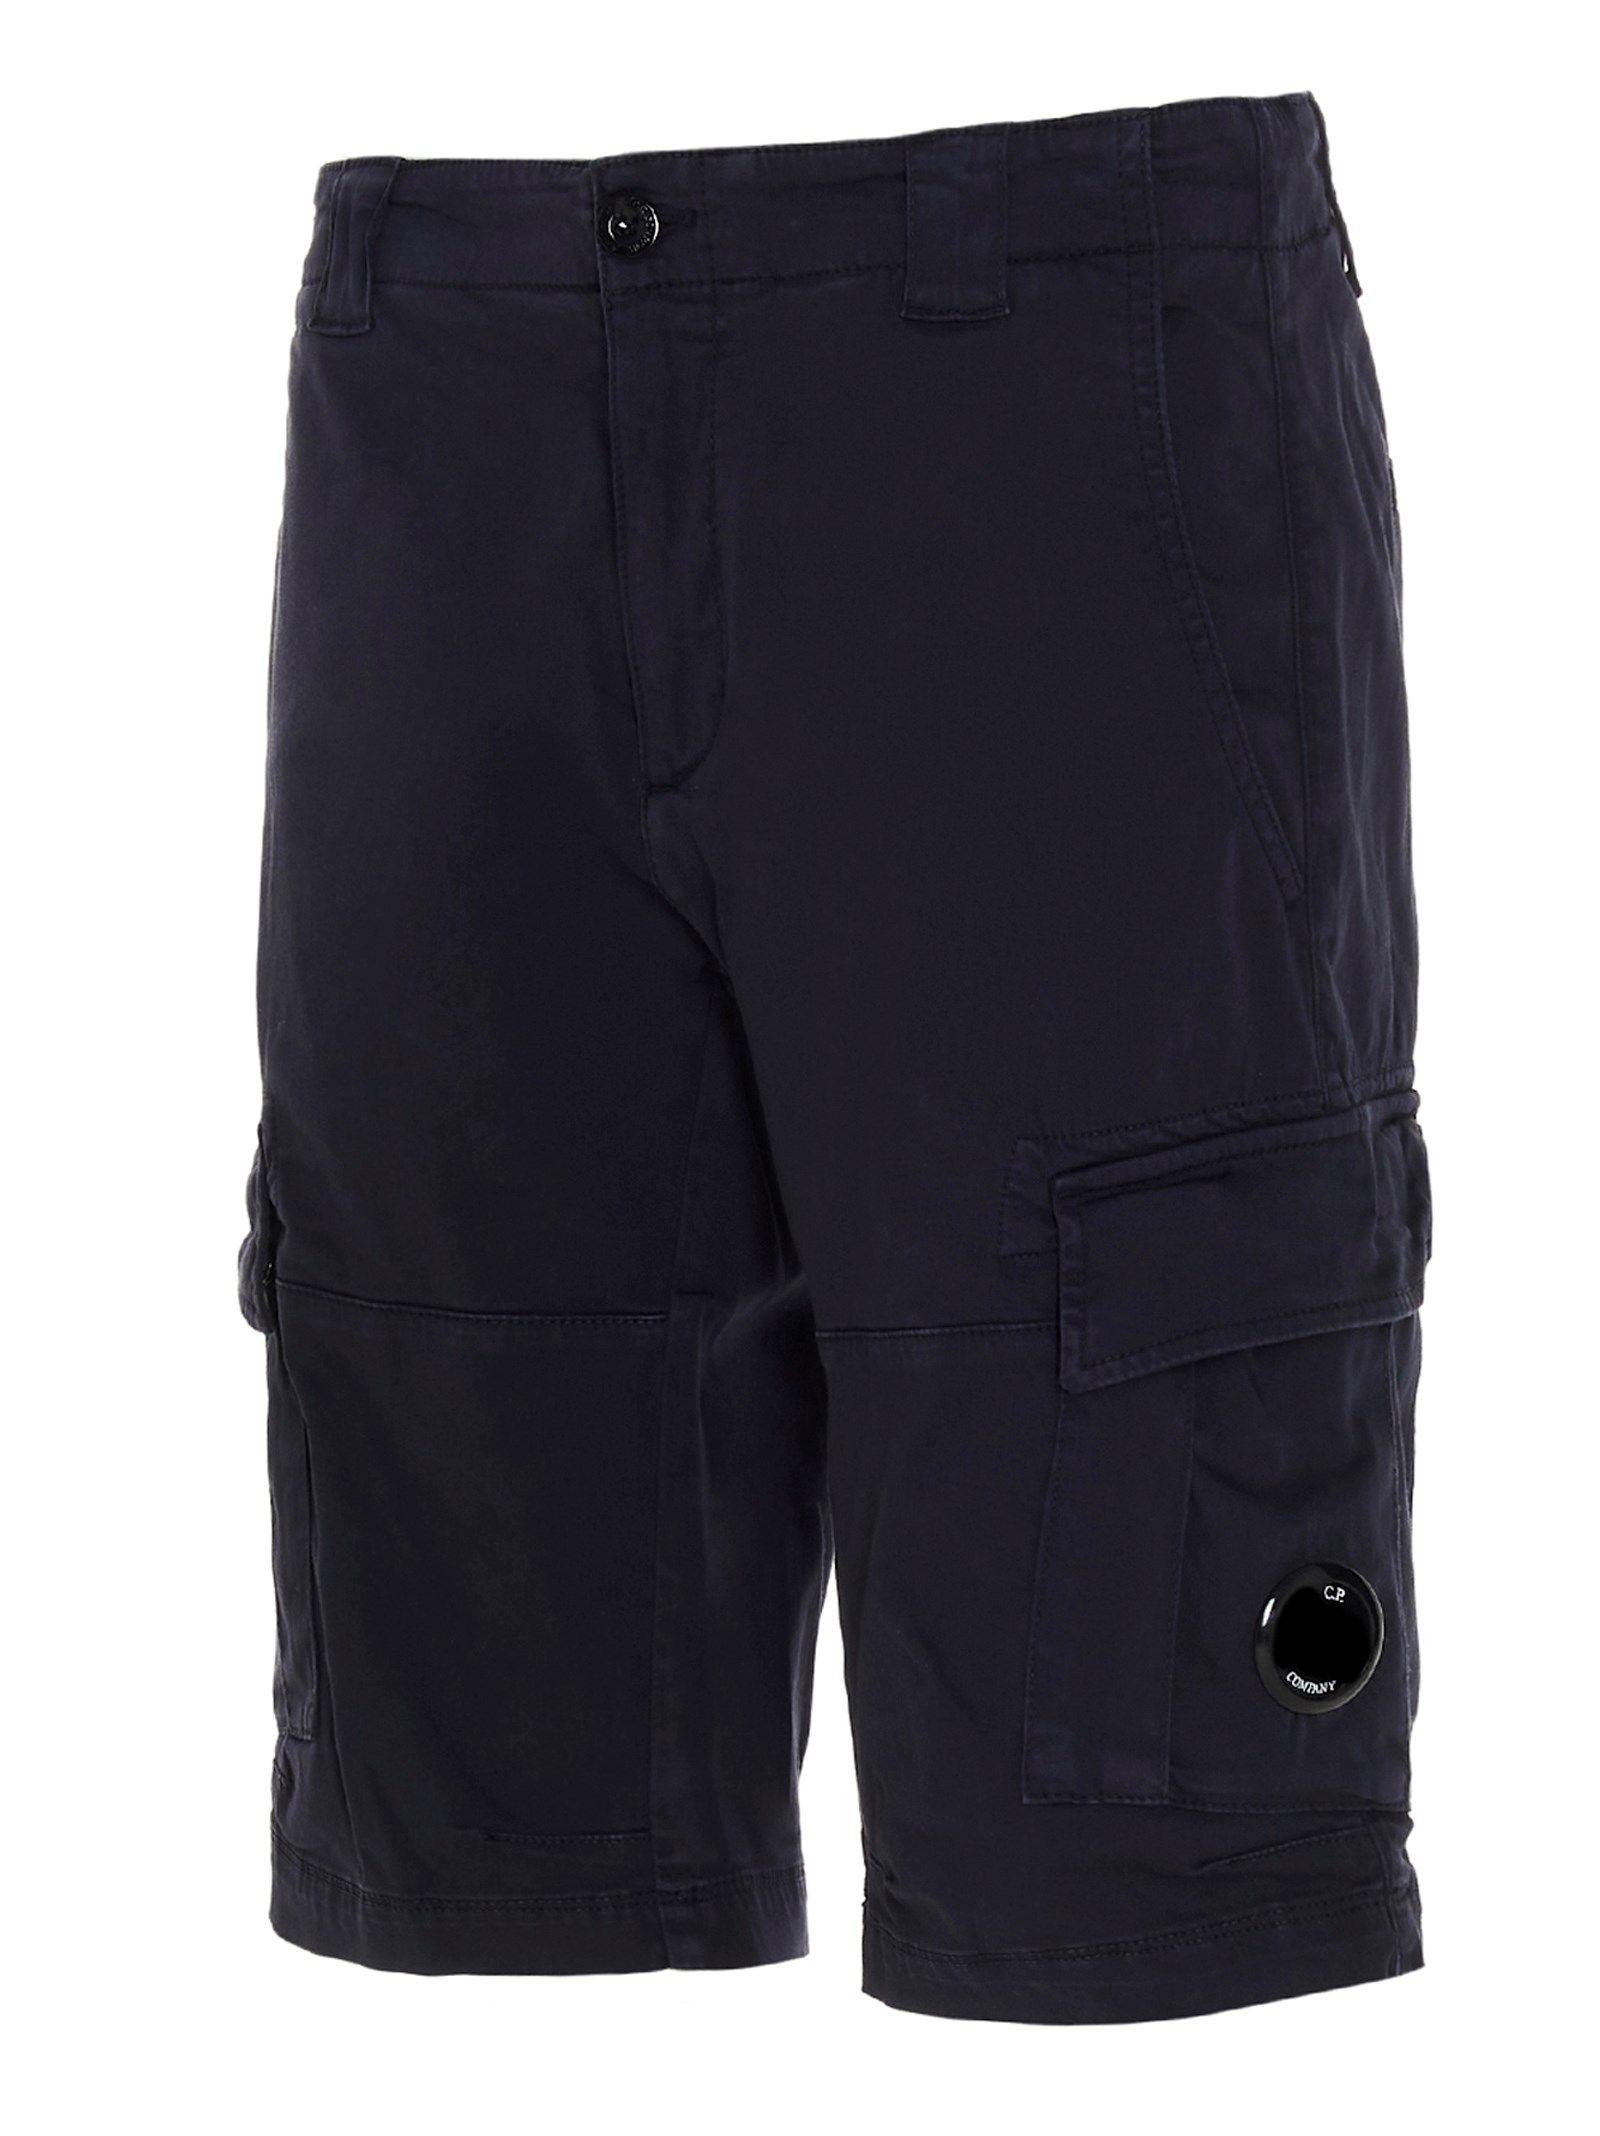 C.P. COMPANY Shorts CP COMPANY MEN'S BLUE OTHER MATERIALS SHORTS